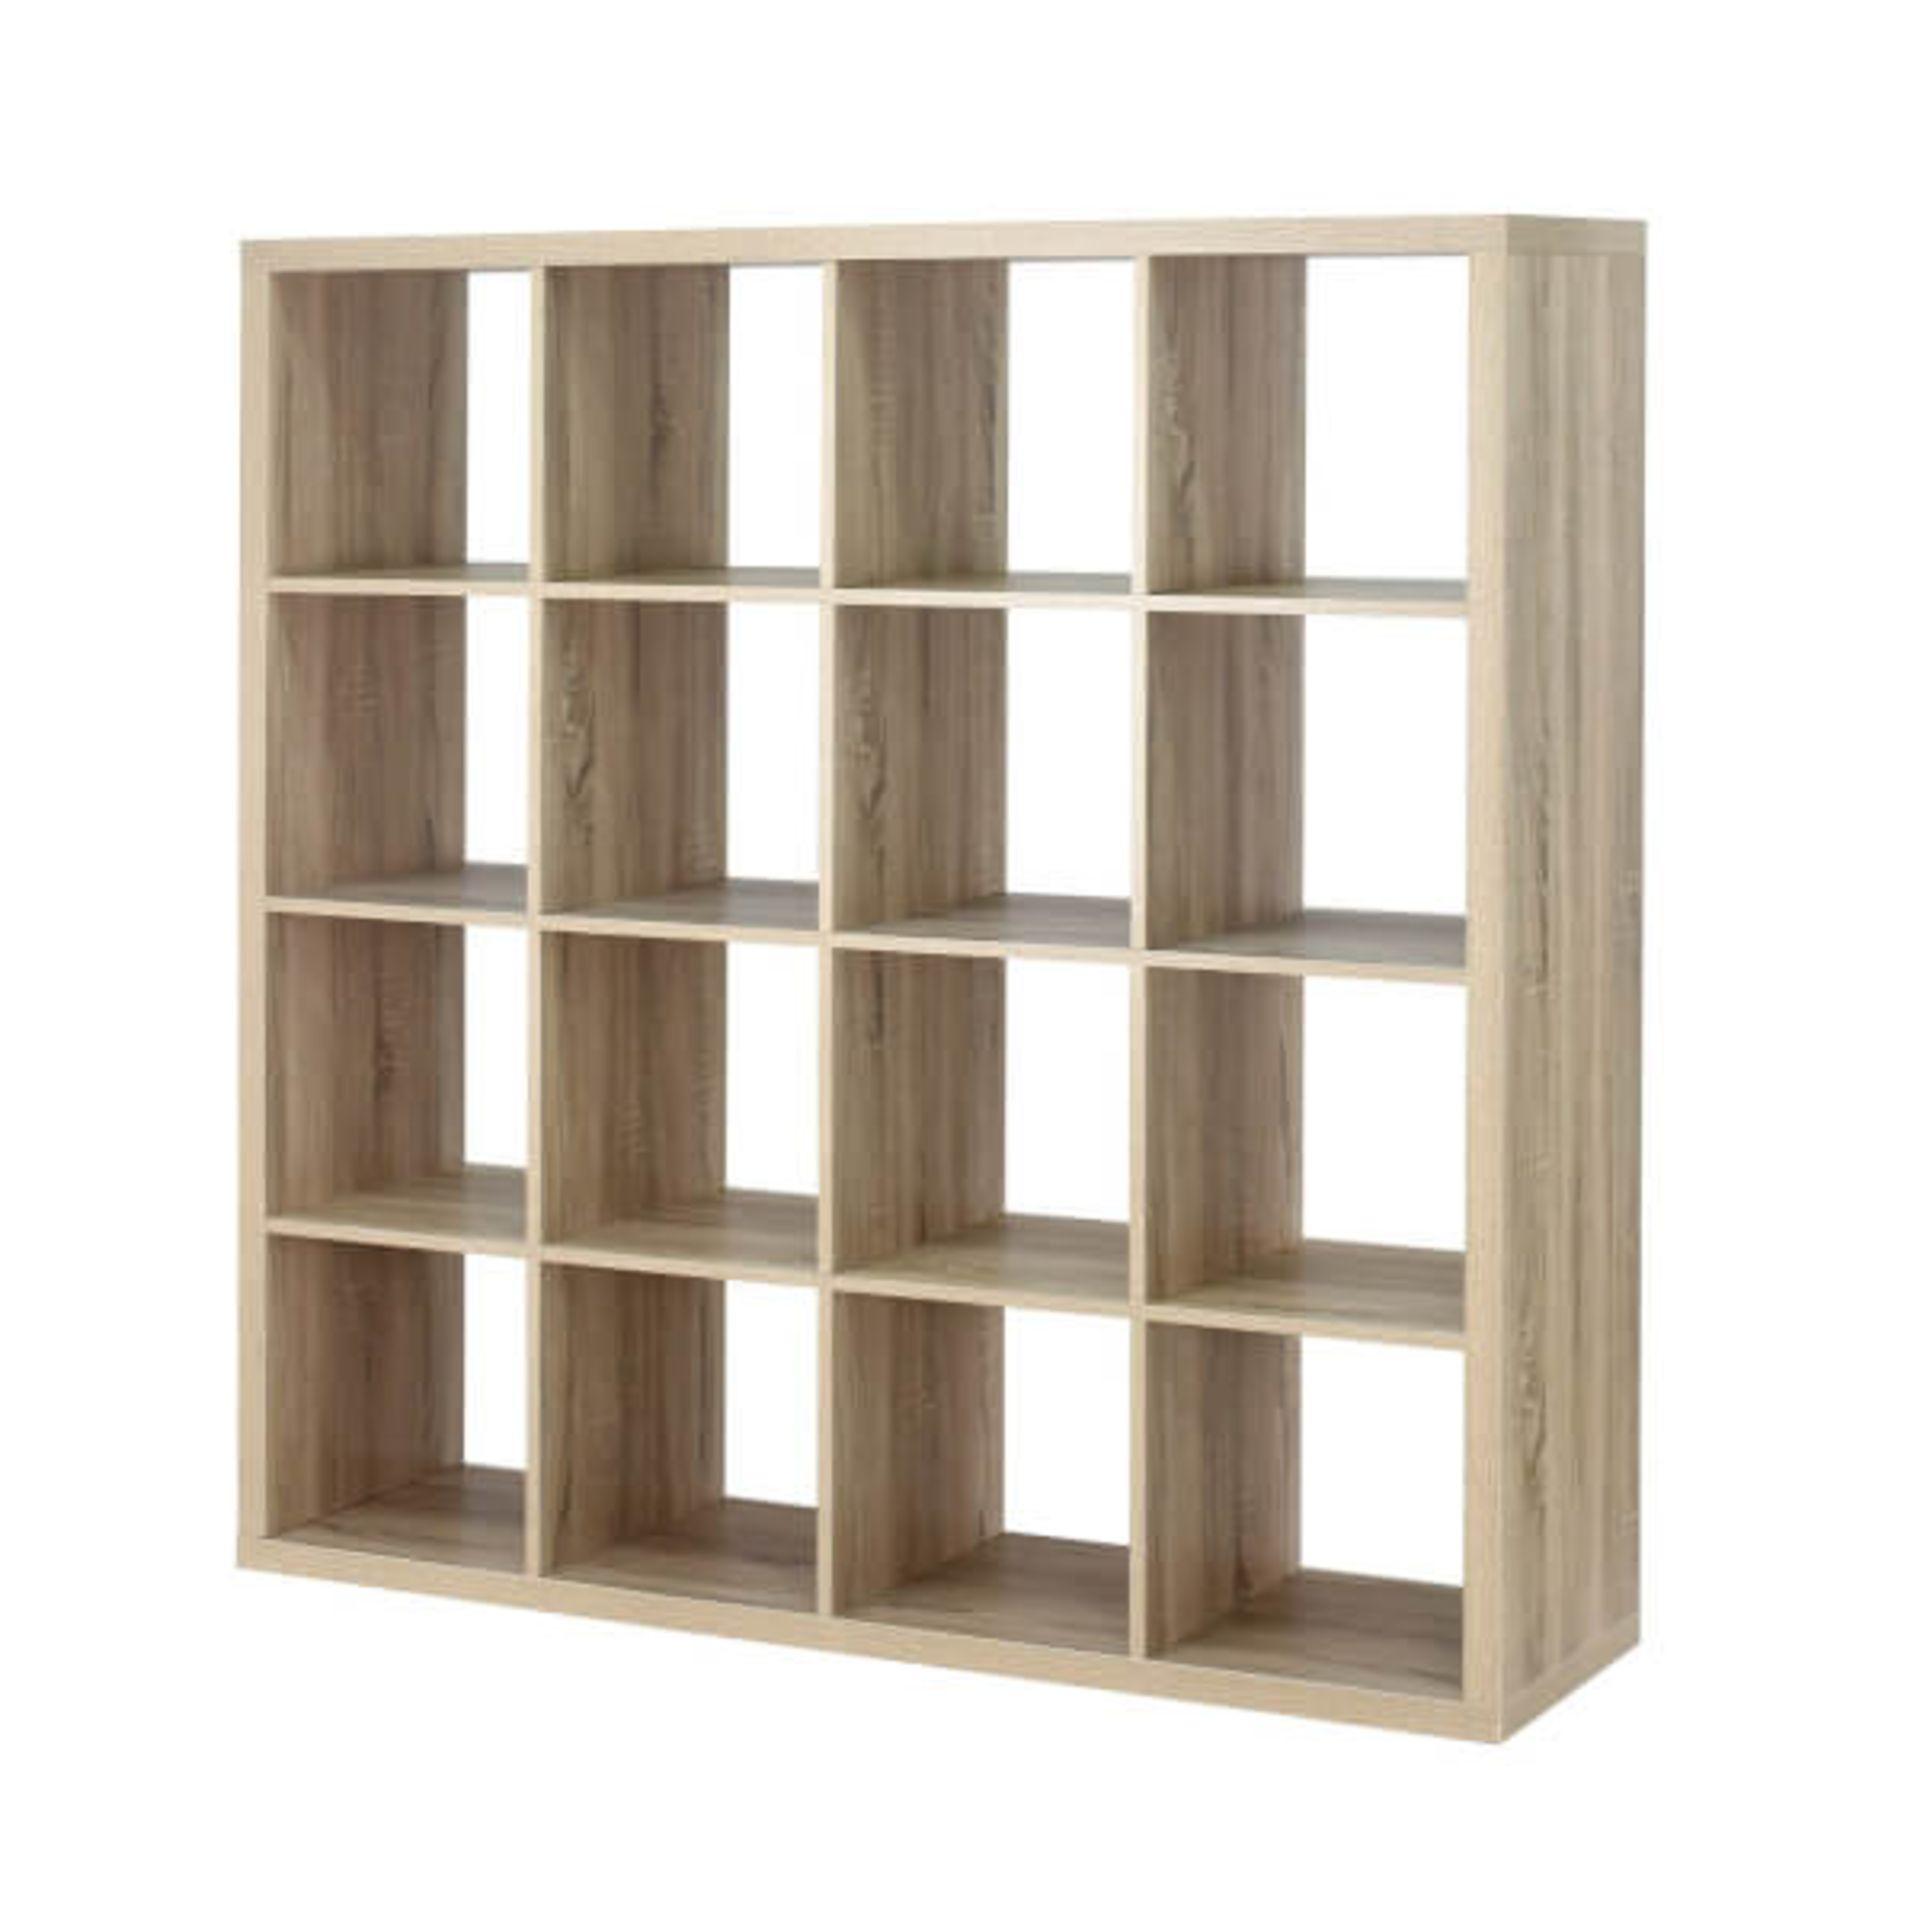 (2K) 4x Items. 1x Hamilton Shoe Cabinet Charcoal. 1x Hamilton Hallway Cabinet Navy (H76x W70x D32.5 - Image 4 of 8